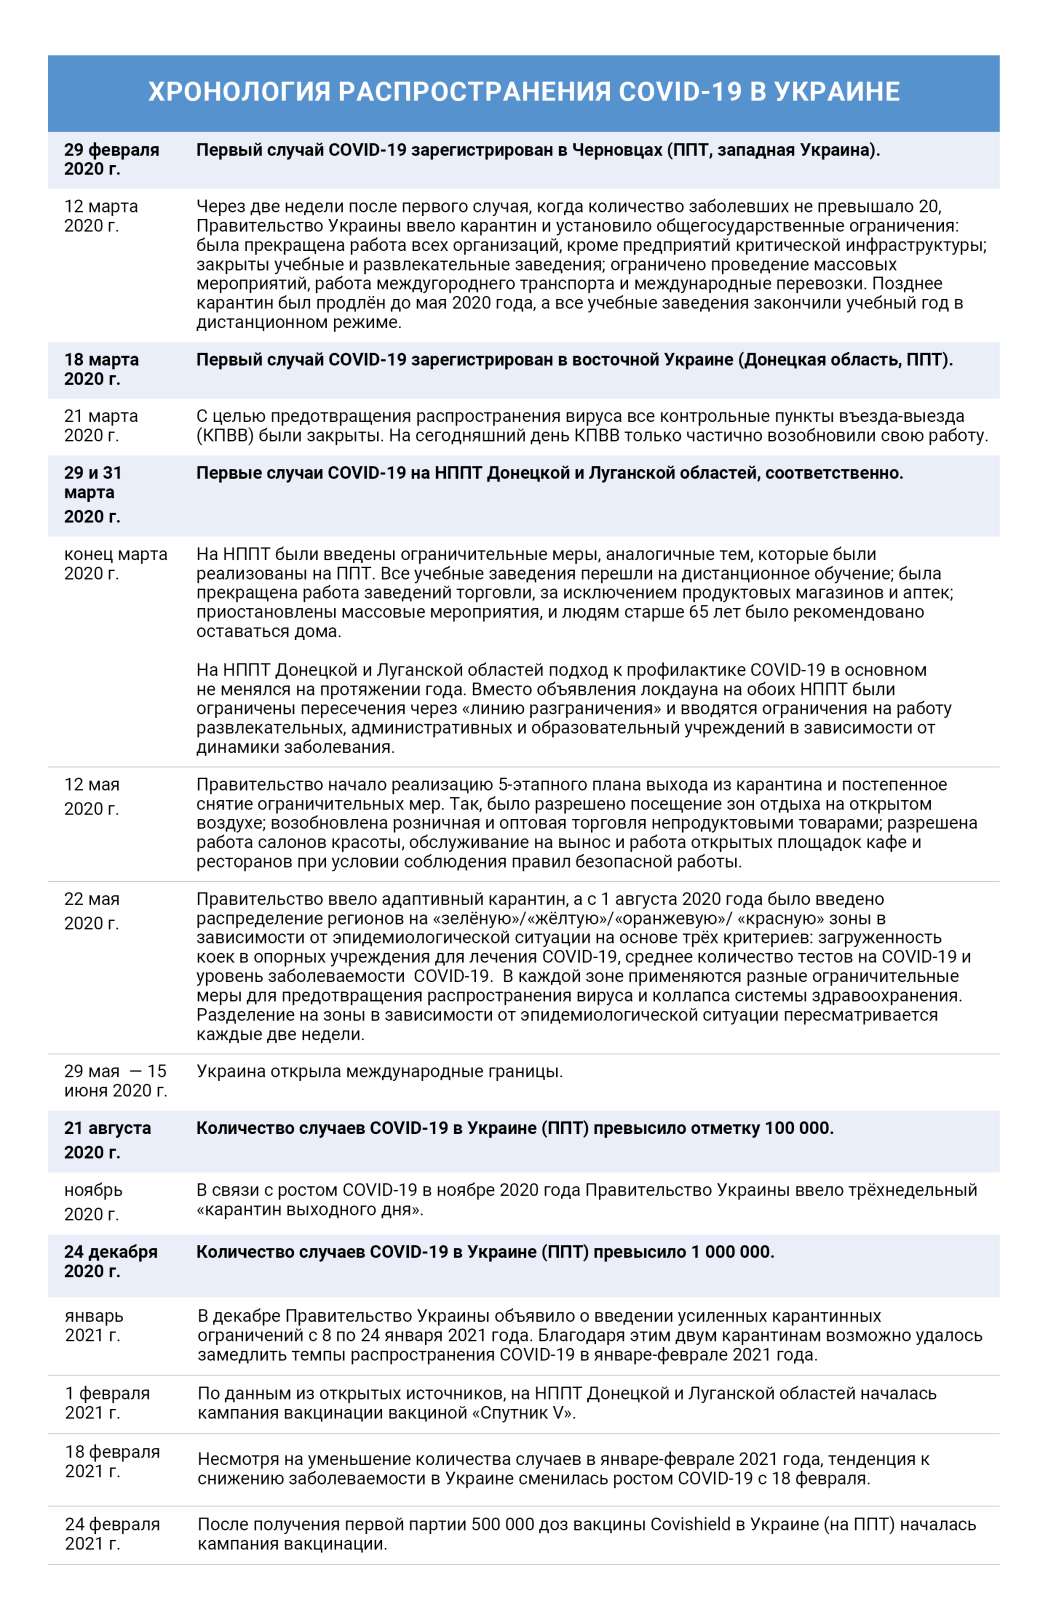 Хронология распространения COVID-19